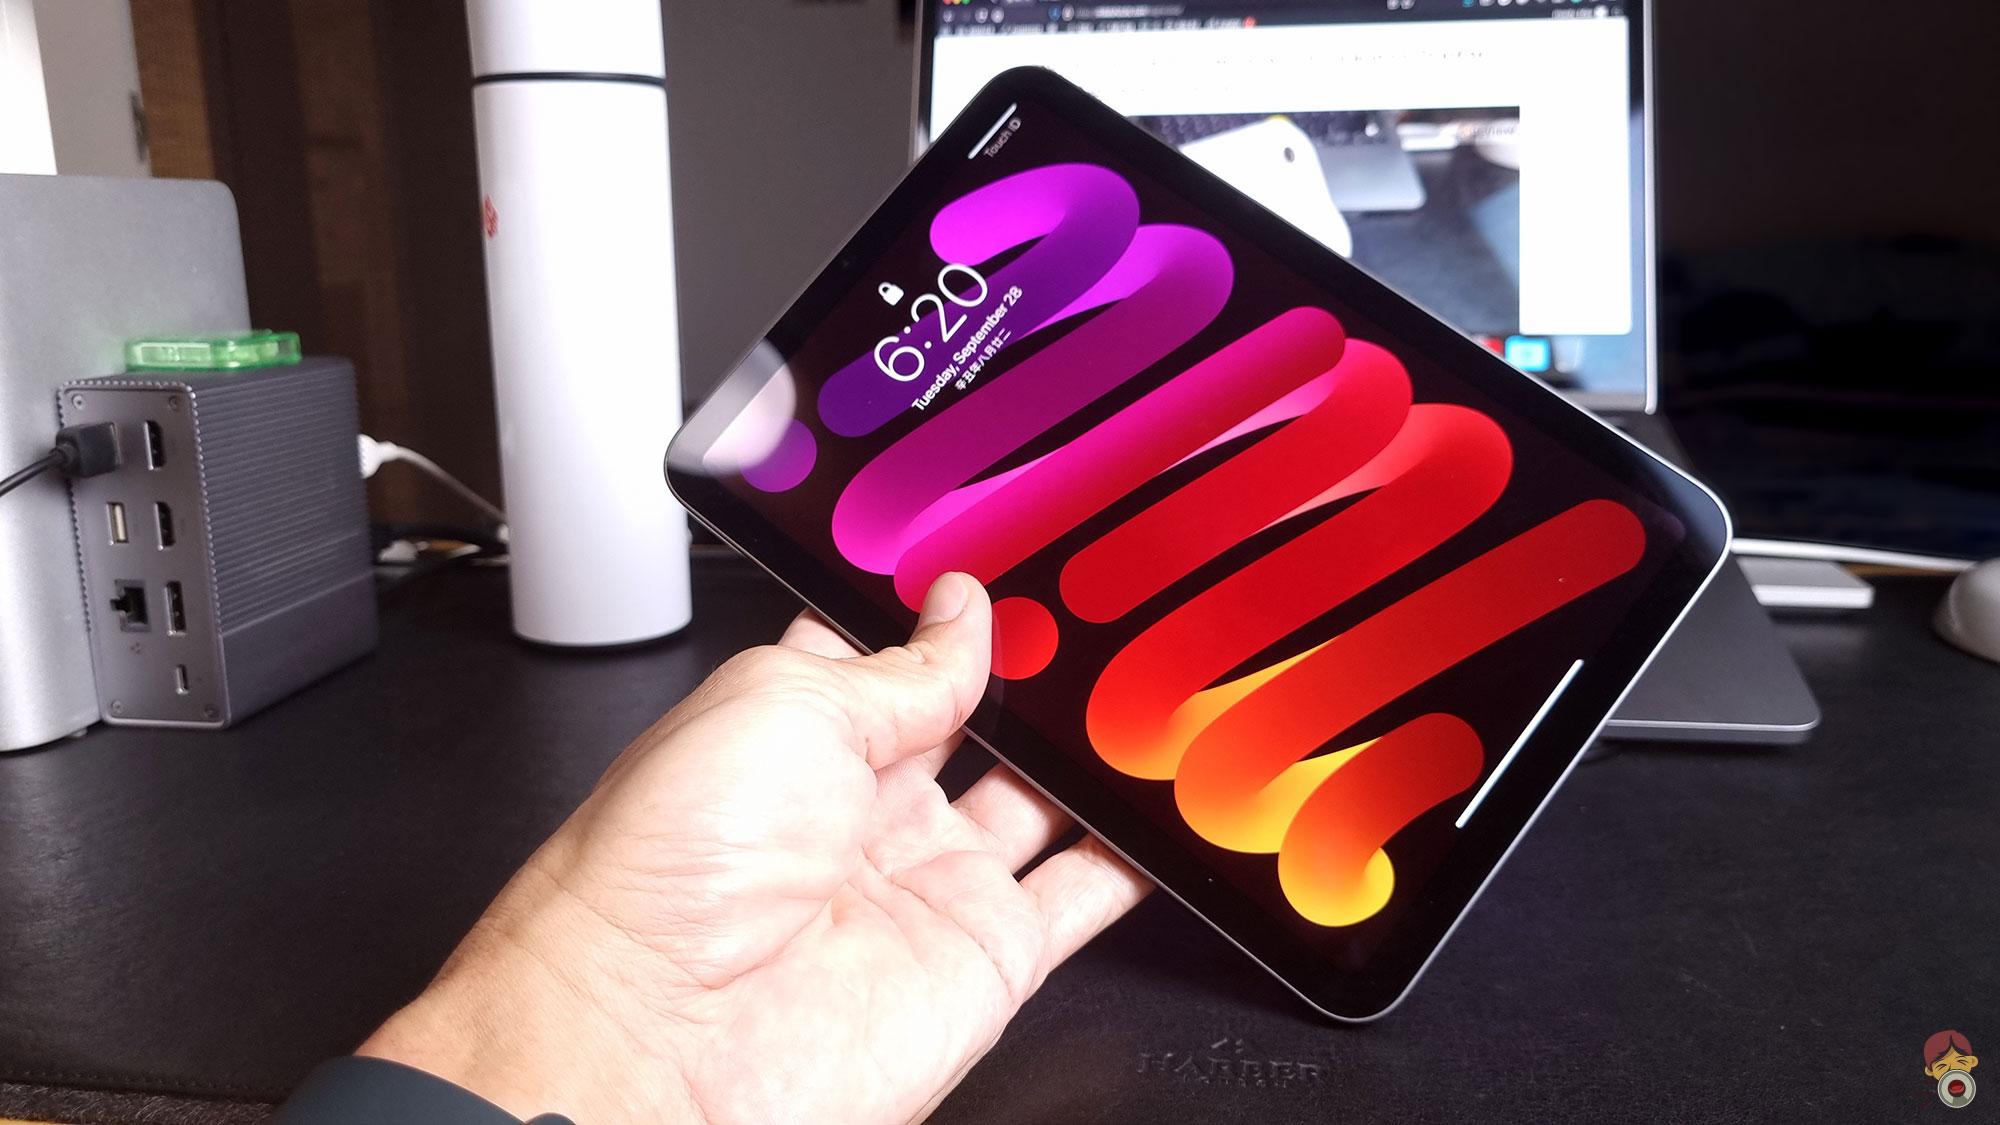 2021 Apple iPad mini aka iPad mini 6 Reviewed